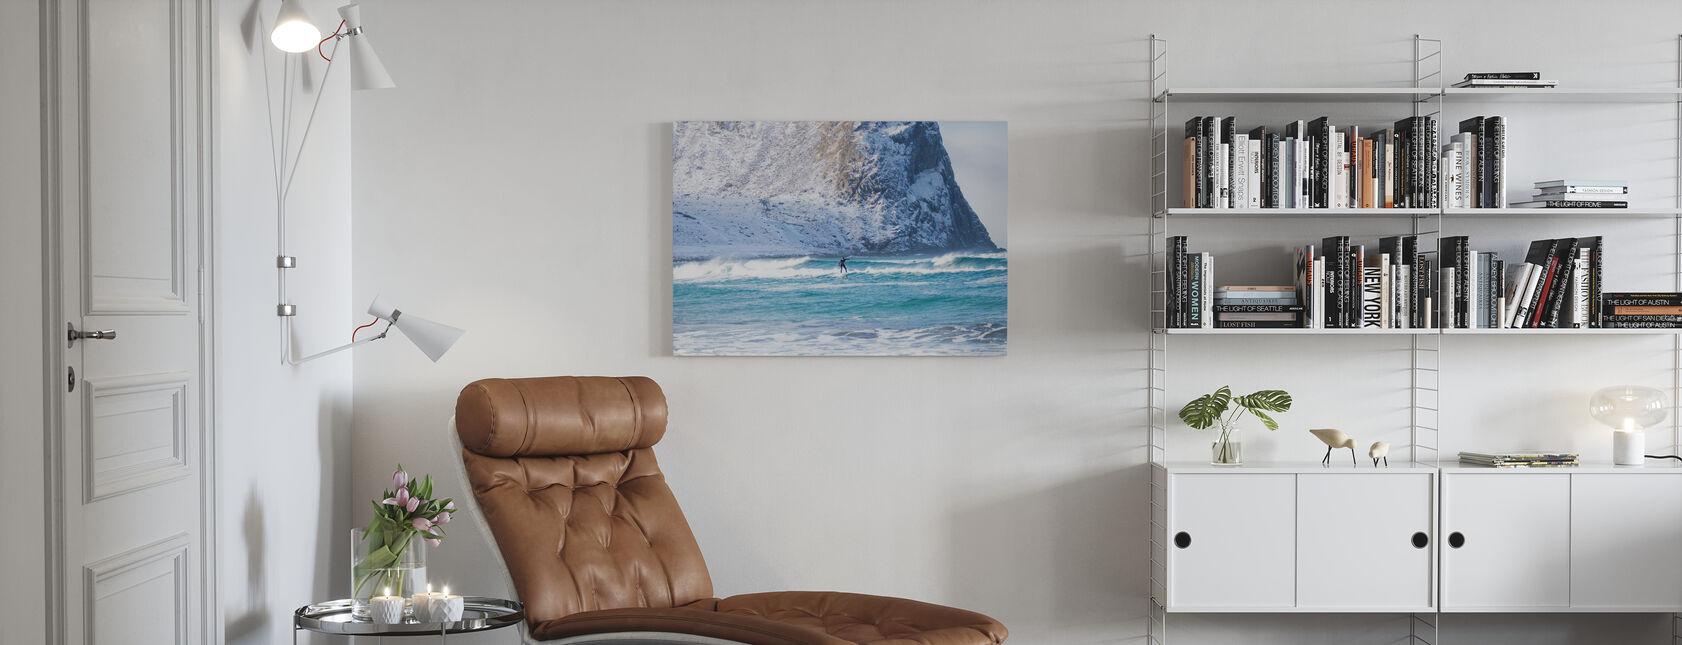 Surfing Lofoten om vinteren - Lerretsbilde - Stue